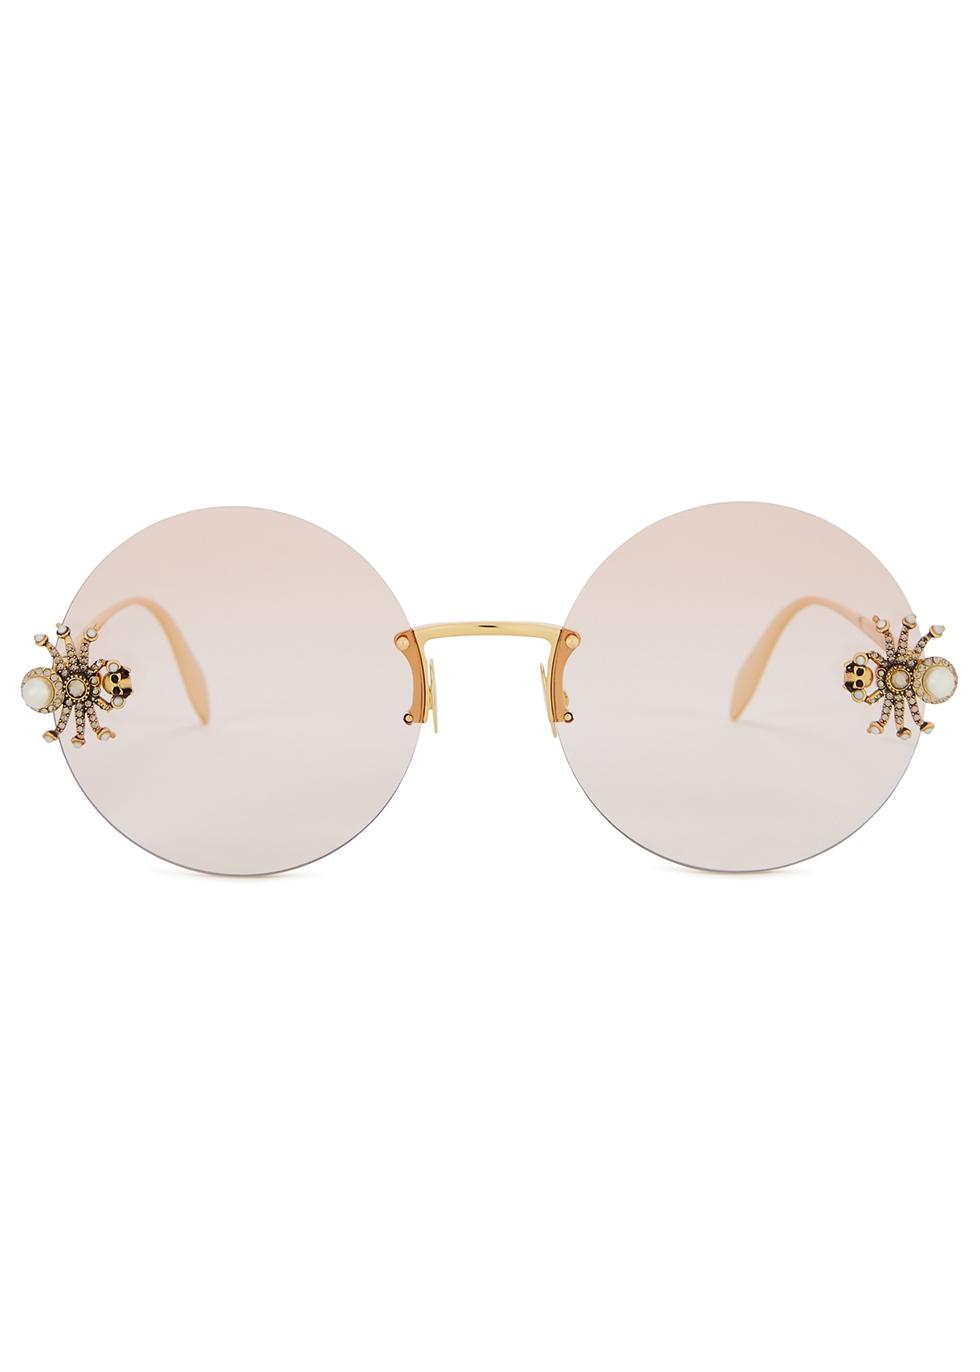 Embellished round-frame sunglasses - Alexander McQueen